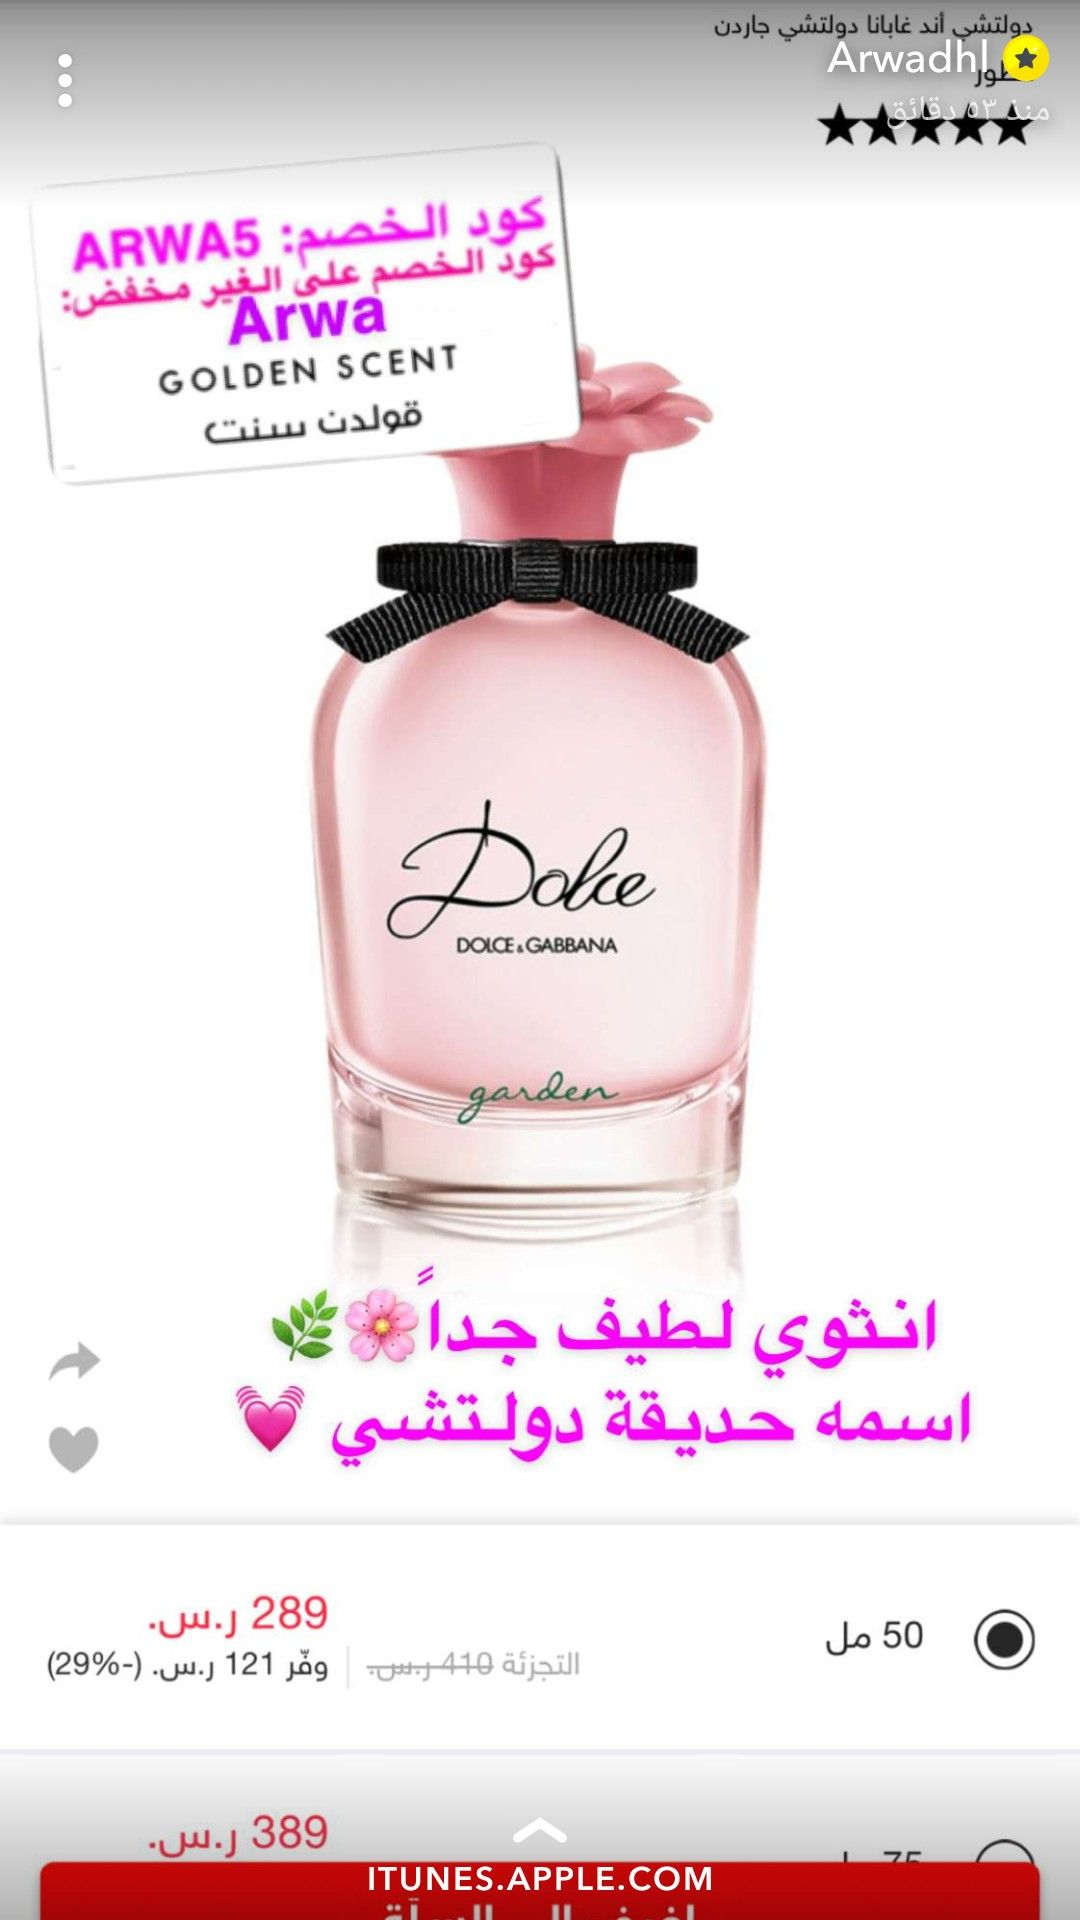 Pin By Raneem On عواطف ام صبا Perfume Perfume Bottles Scent